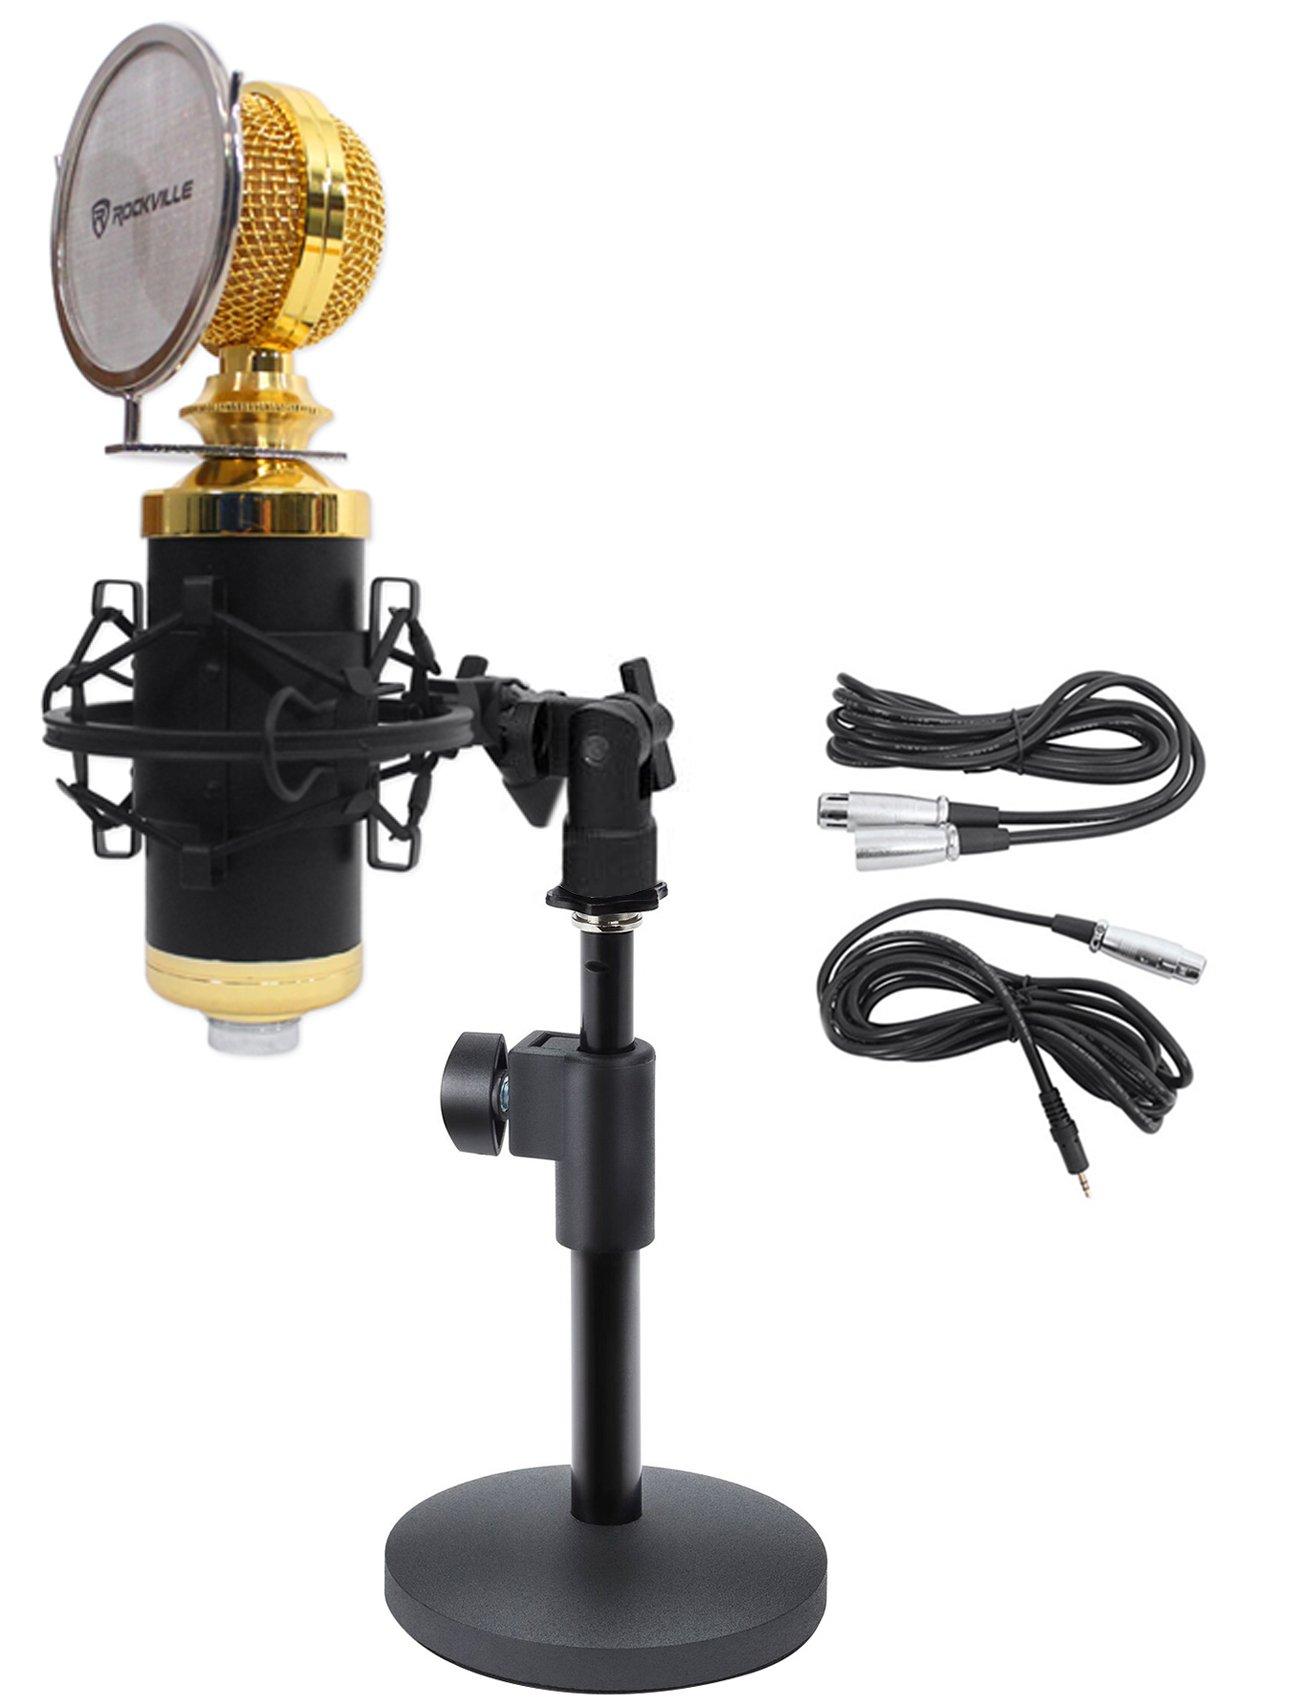 Rockville RCM02 Studio Podcast Recording Microphone+Samson Desktop Mic Stand